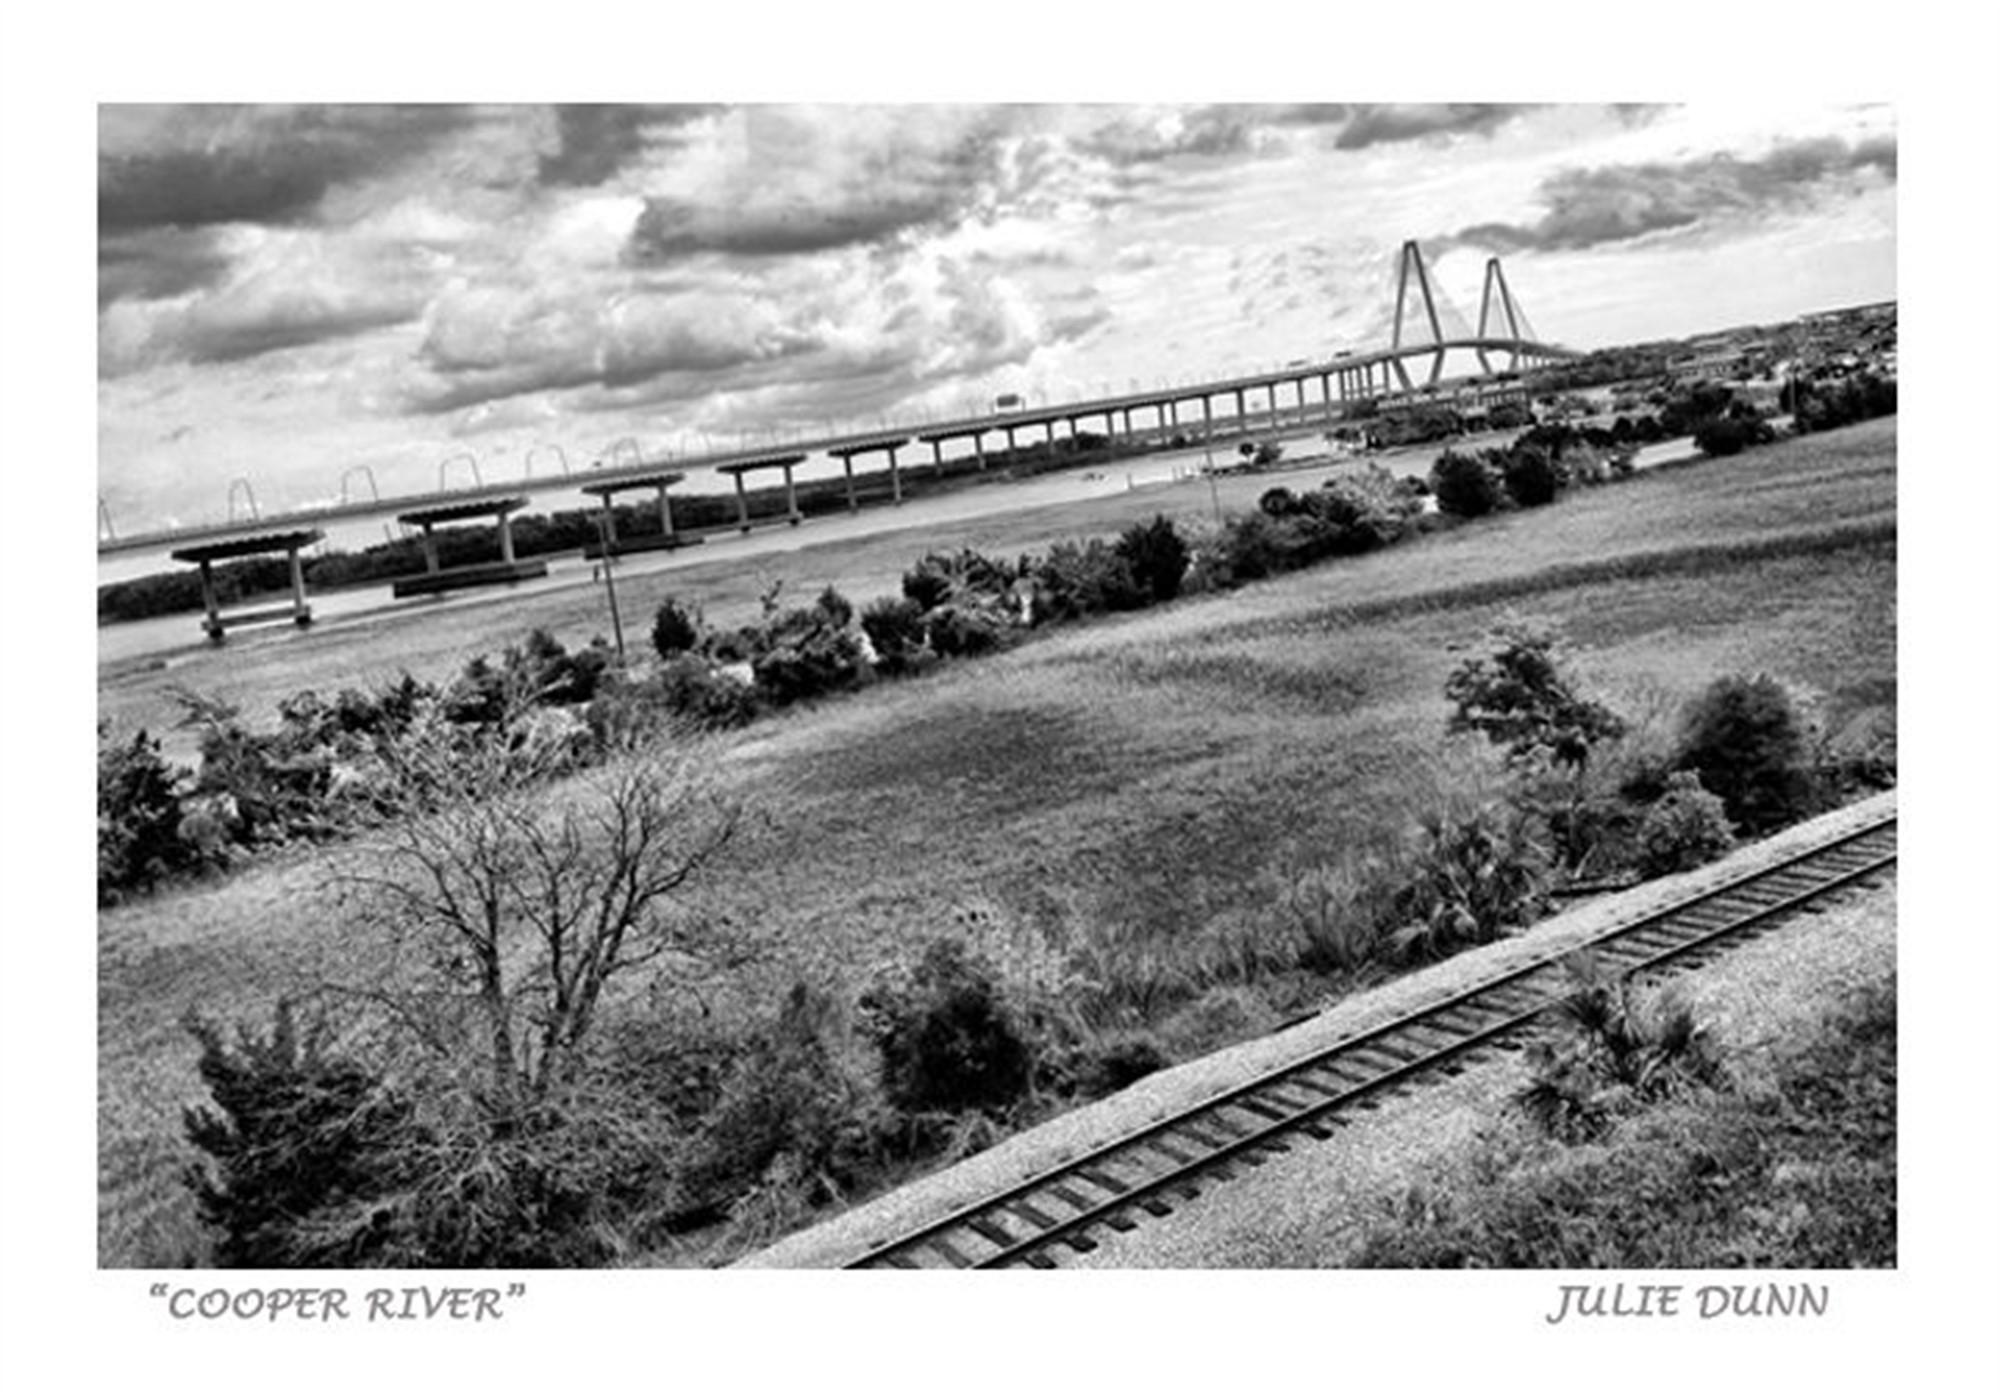 Cooper River by Julie Dunn